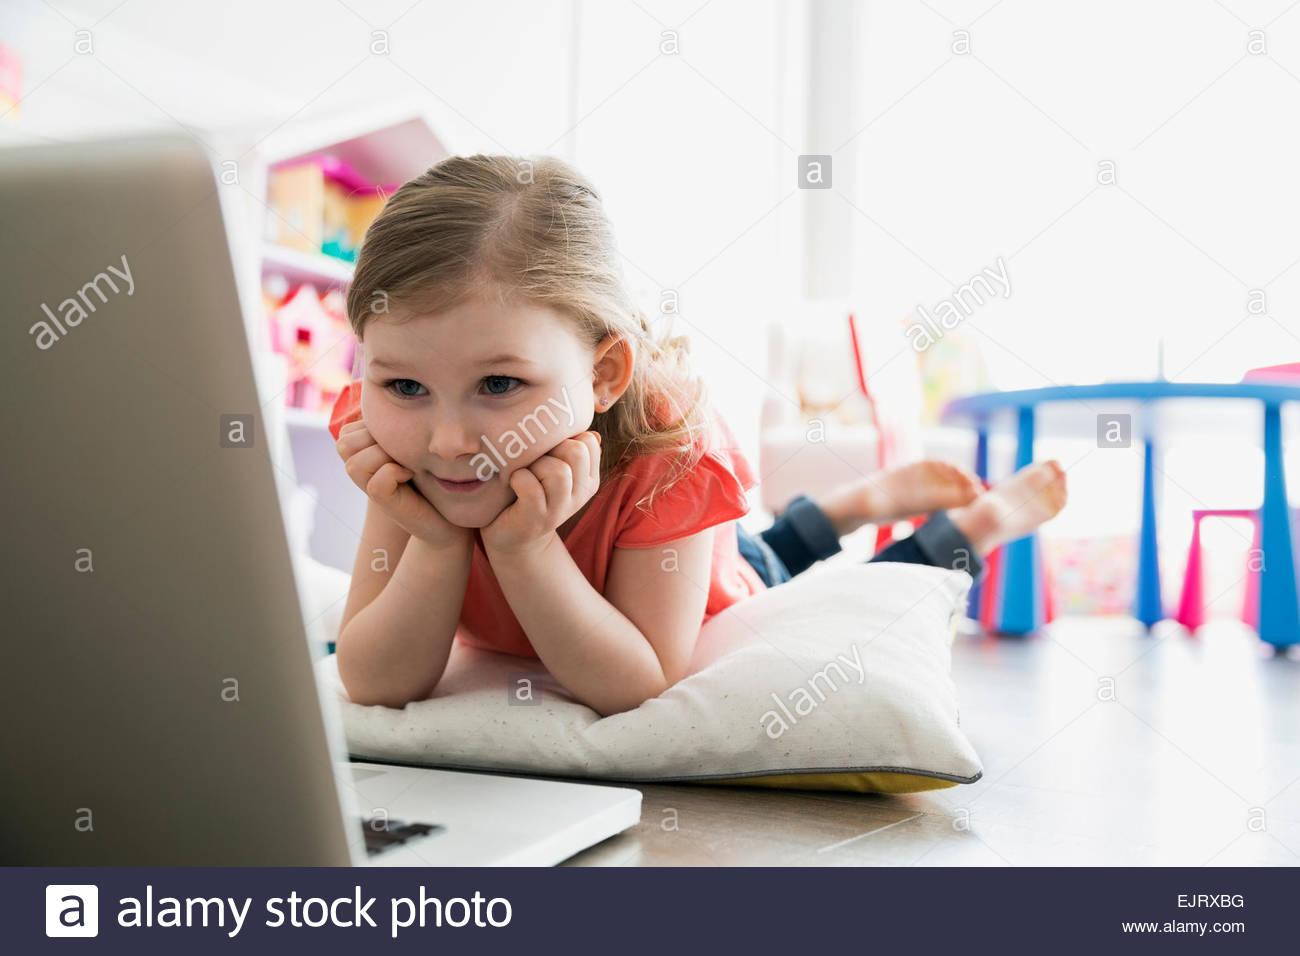 Mädchen mit Laptop im Stock mit Kissen Stockbild